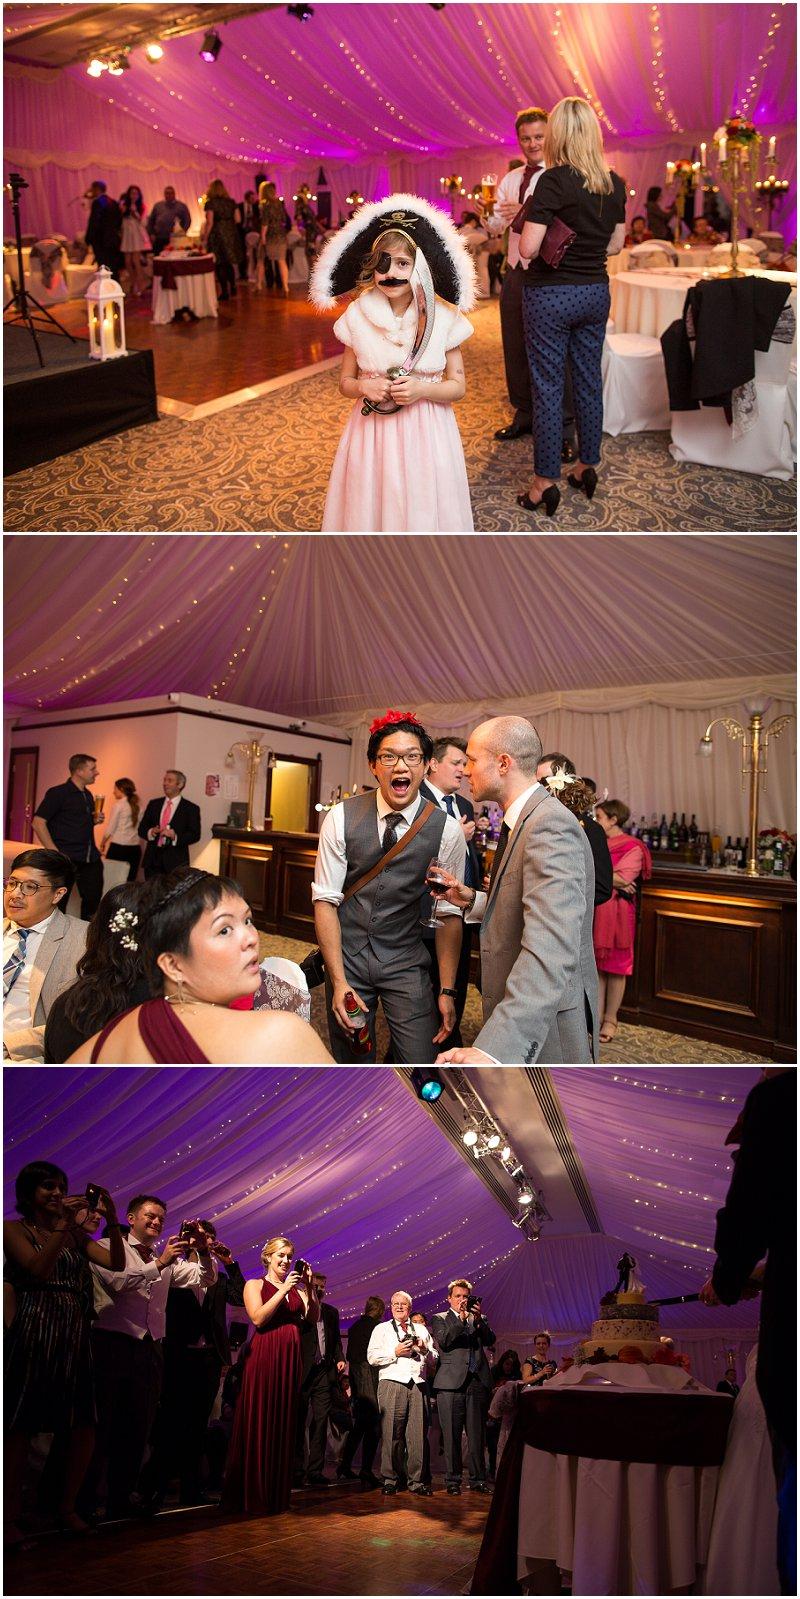 Pirate! Wrea Green Wedding at The Villa Lancashire